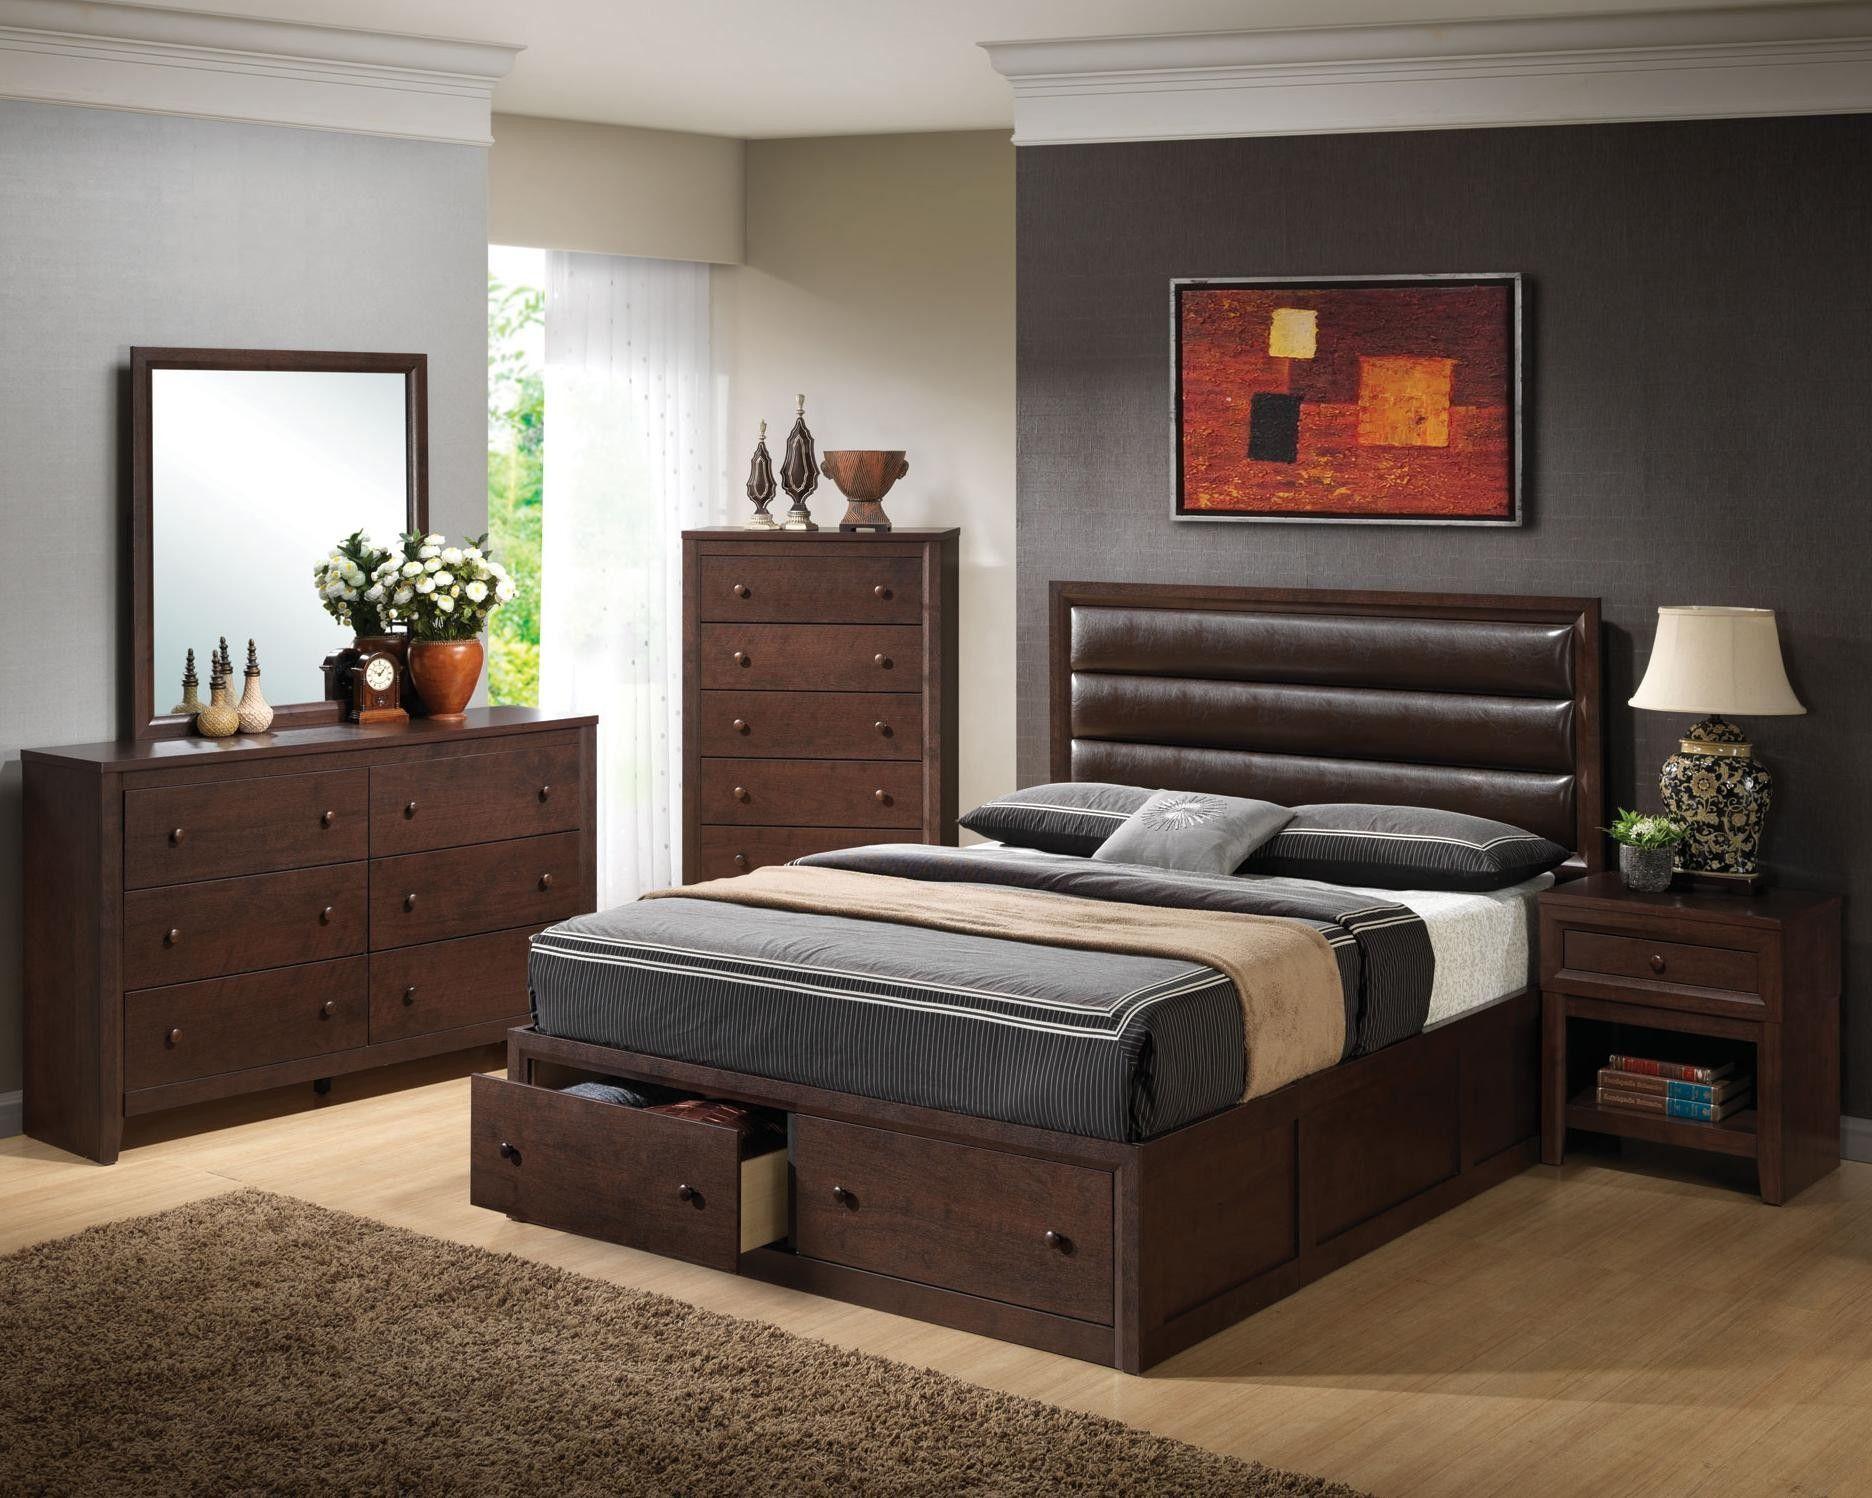 Remington Queen Platform Bed w/ Upholstered Headboard   Bed ...